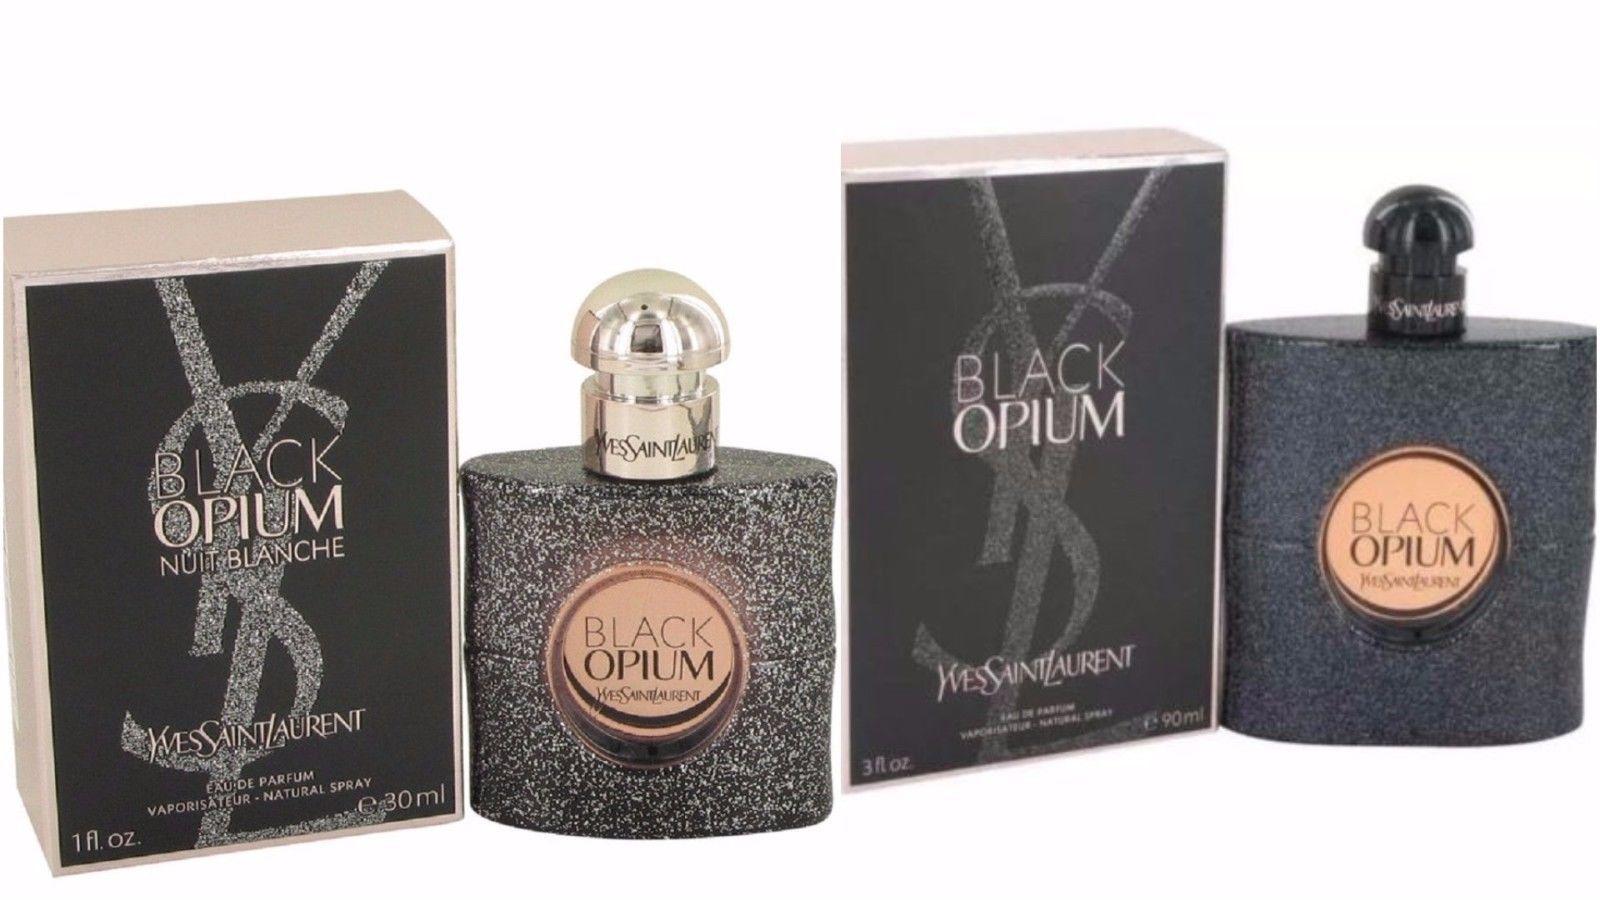 835bb7fb36f S l1600. S l1600. Previous. BLACK OPIUM + Nuit Blanche Perfume Yves Saint  Laurent EDP Spray 1 oz 3 oz WOMEN